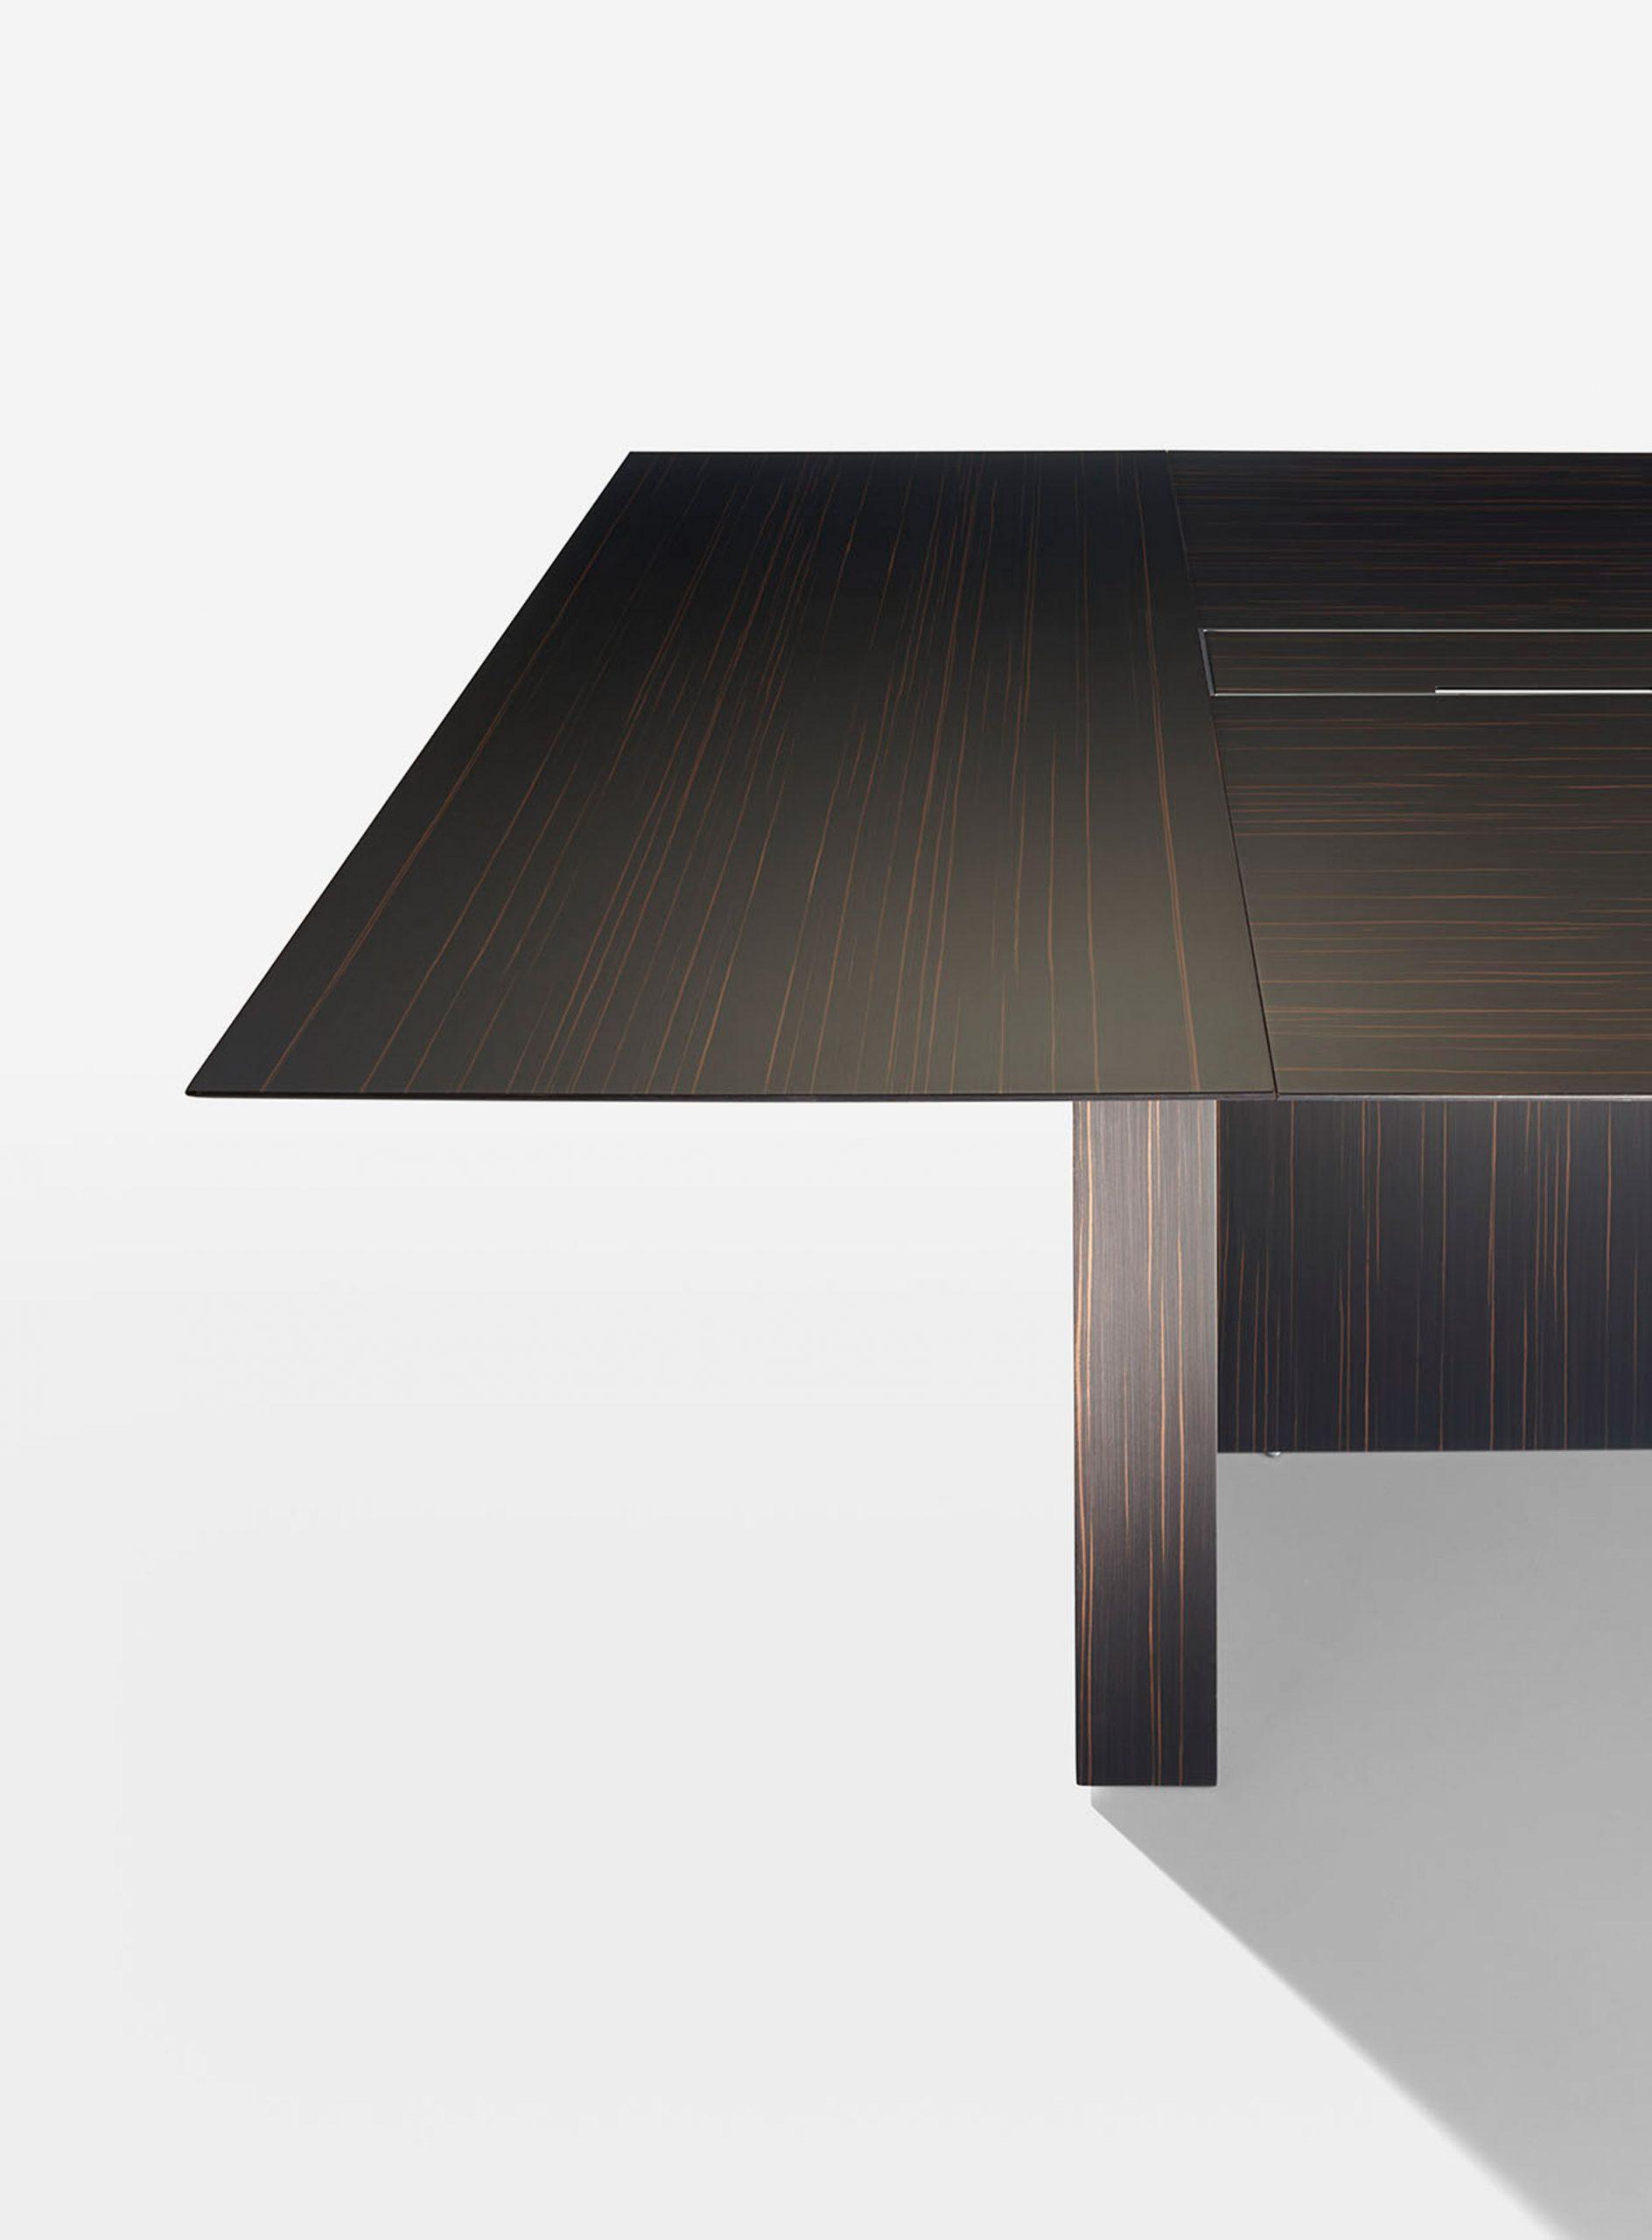 Dark wood office table